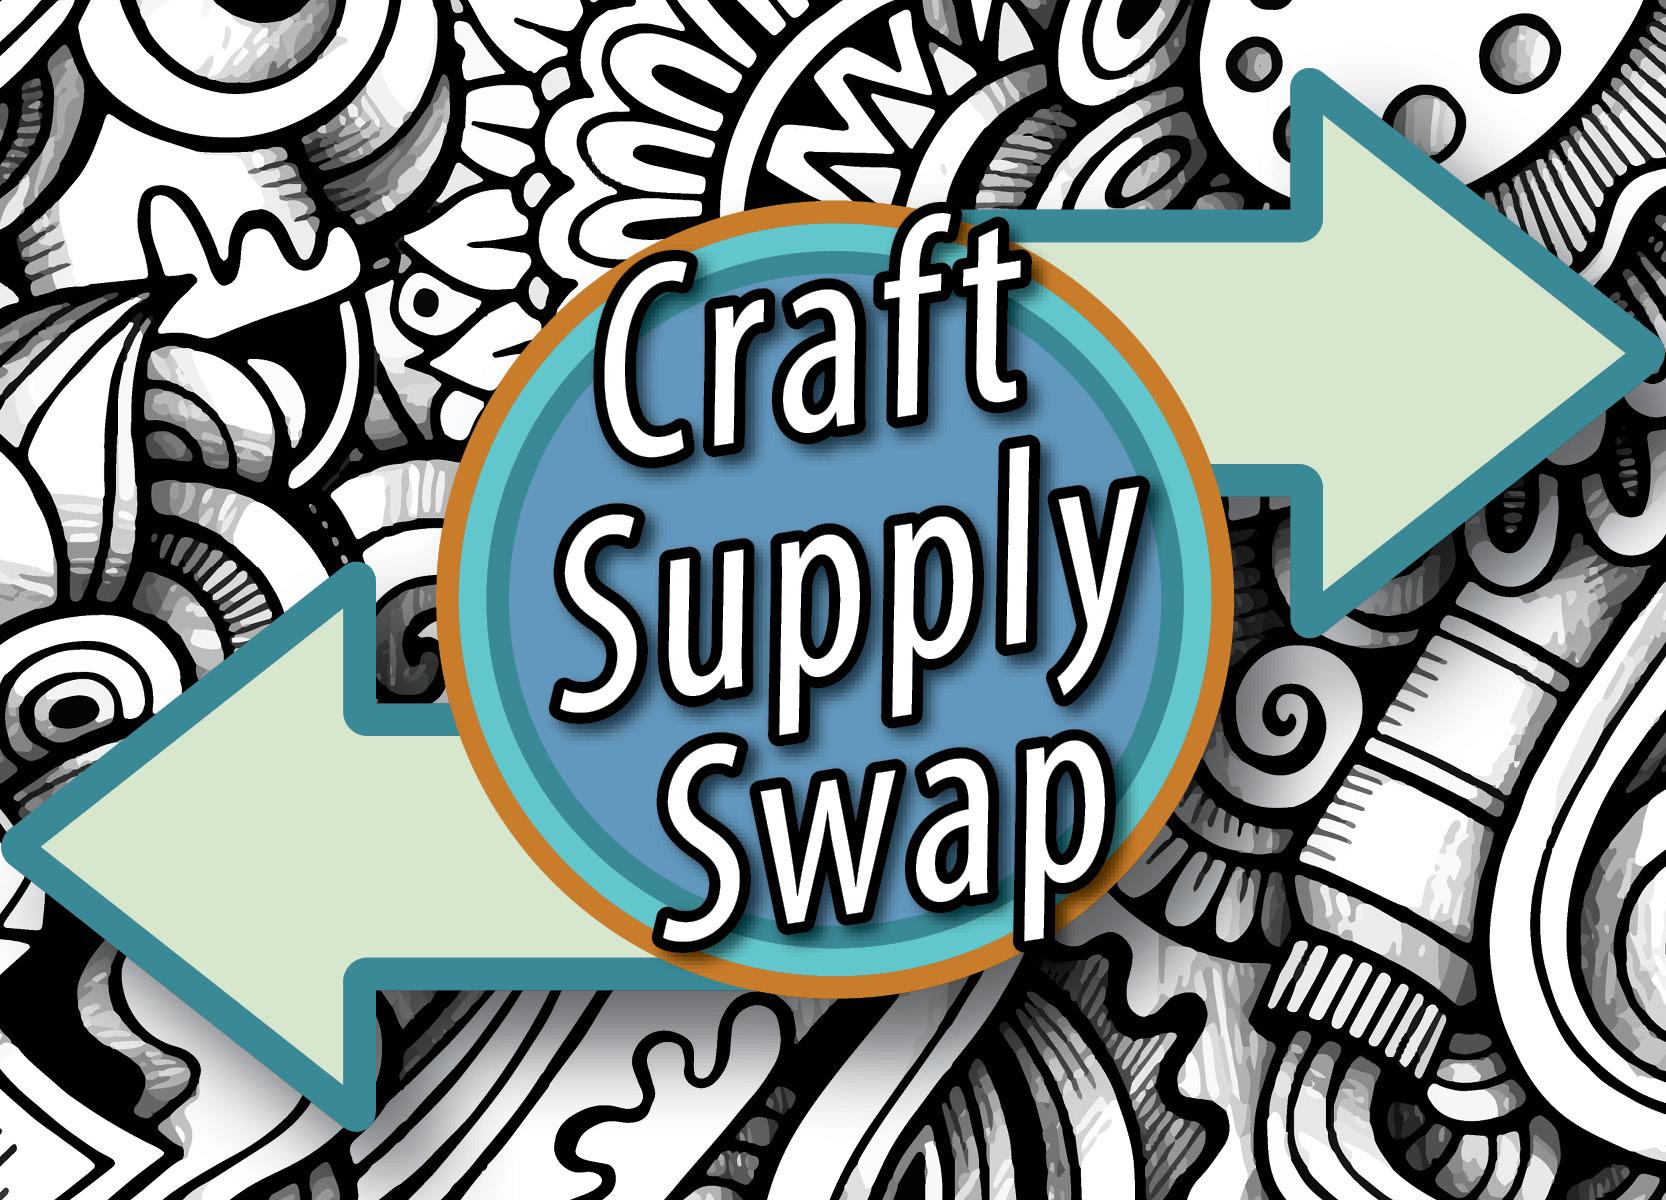 Canceled: Craft Supply Swap